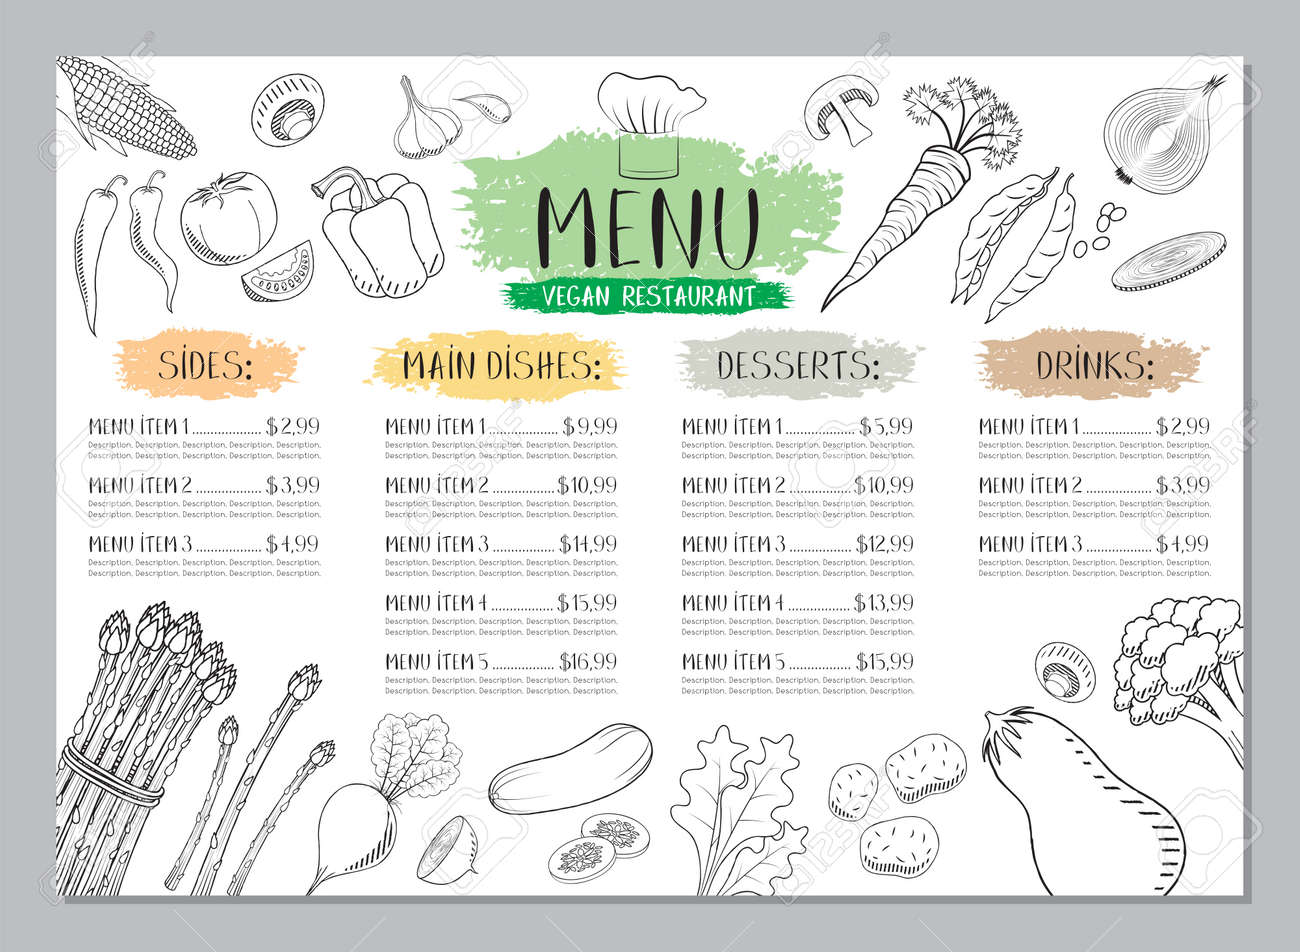 Vegan restaurant menu template - A4 card (vegetables drawings) - 129571127